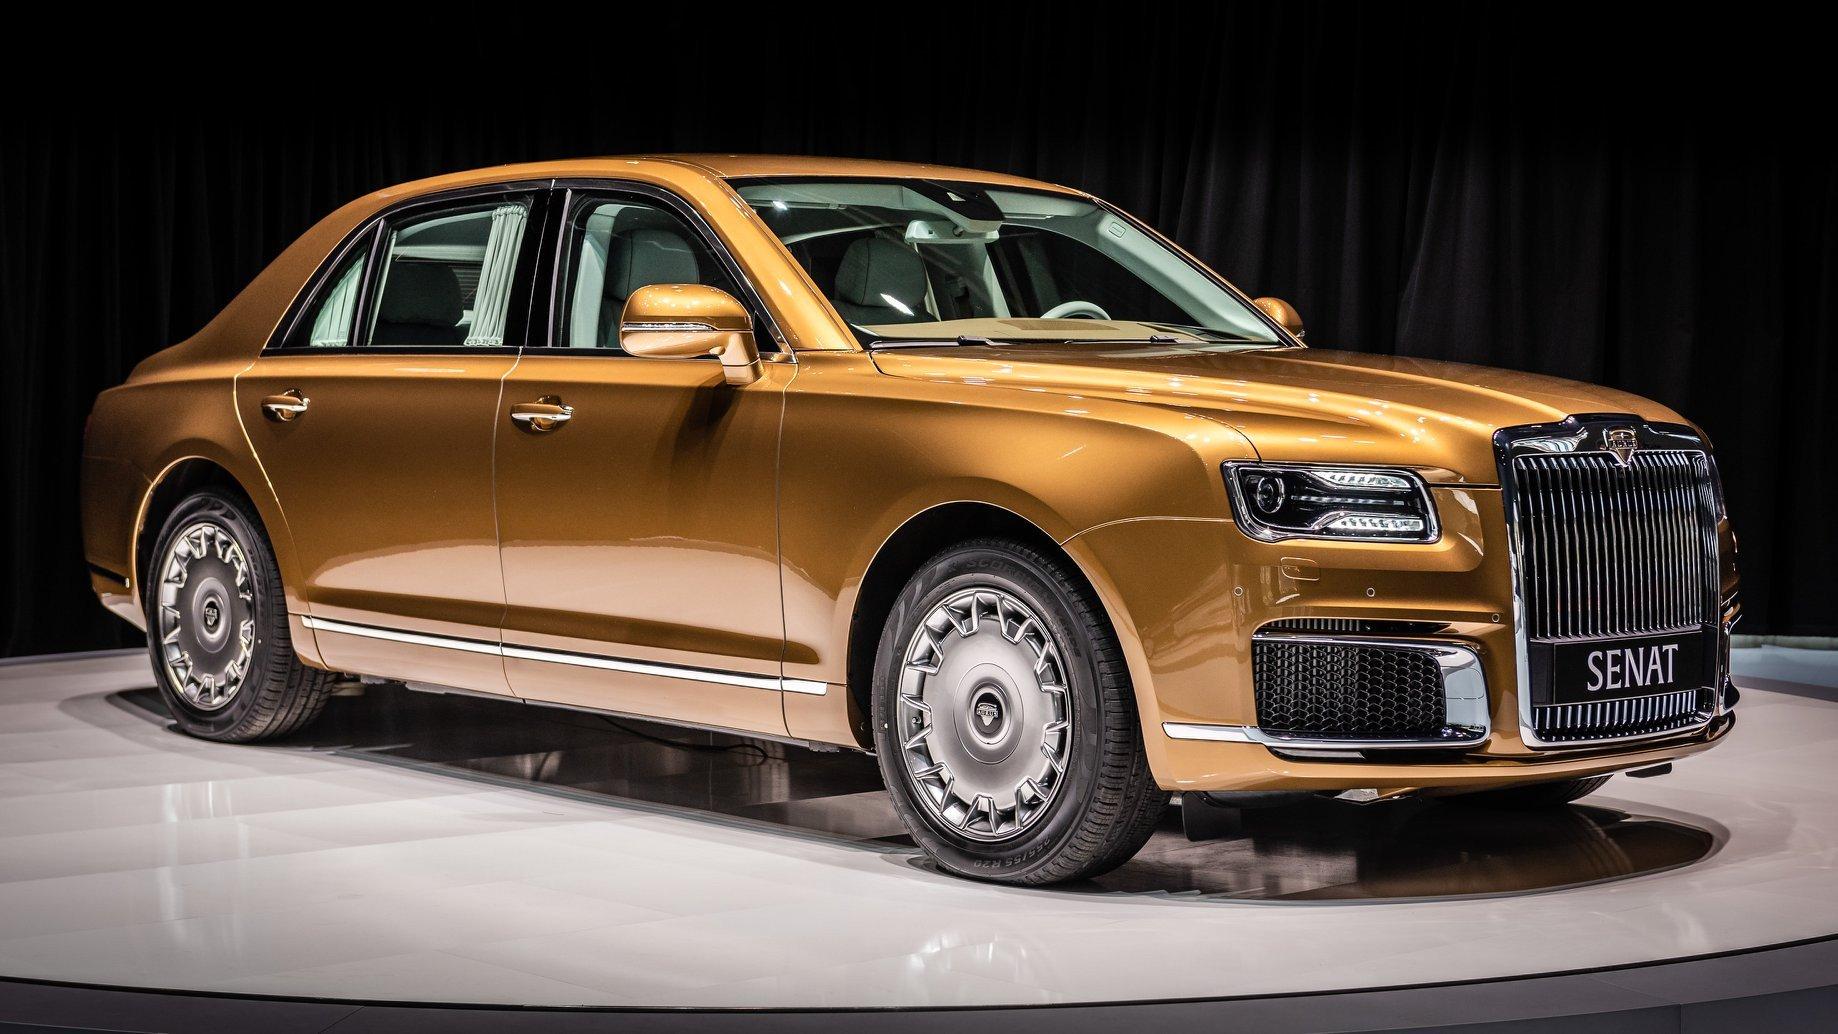 Produsen Mobil Mewah Eropa Mulai Ciut Kehadiran Aurus Dari Rusia Okezone Otomotif